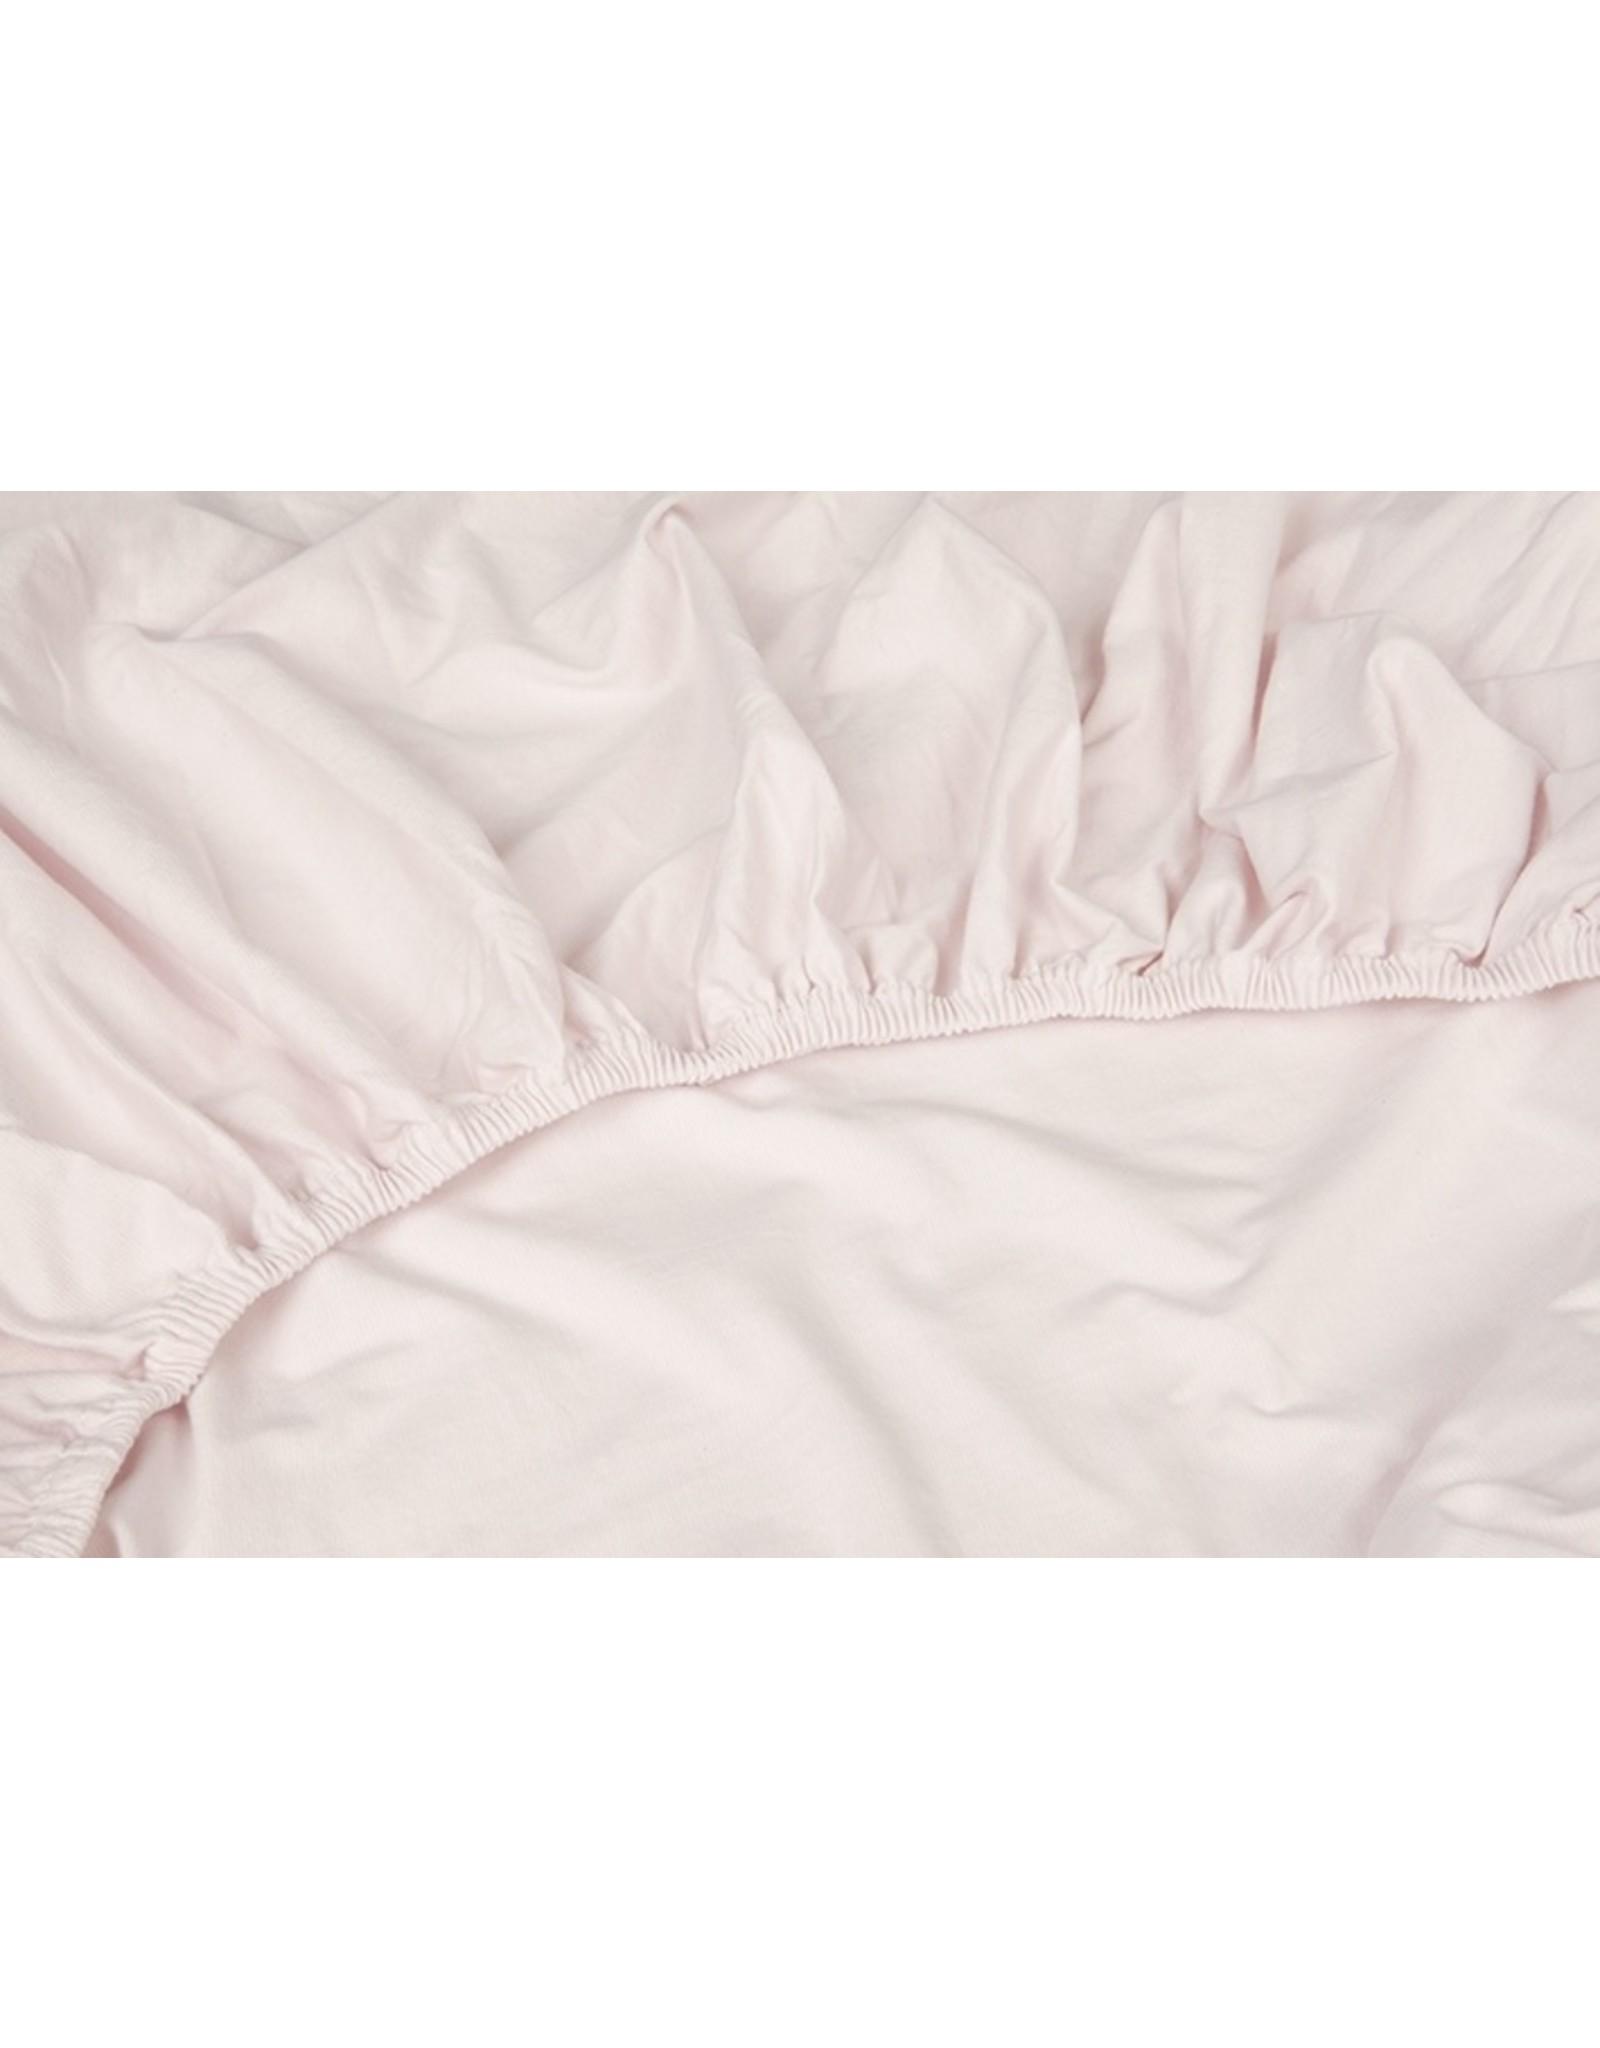 Kayori Kayori Shizu hoeslakens stretch jersey  Roze